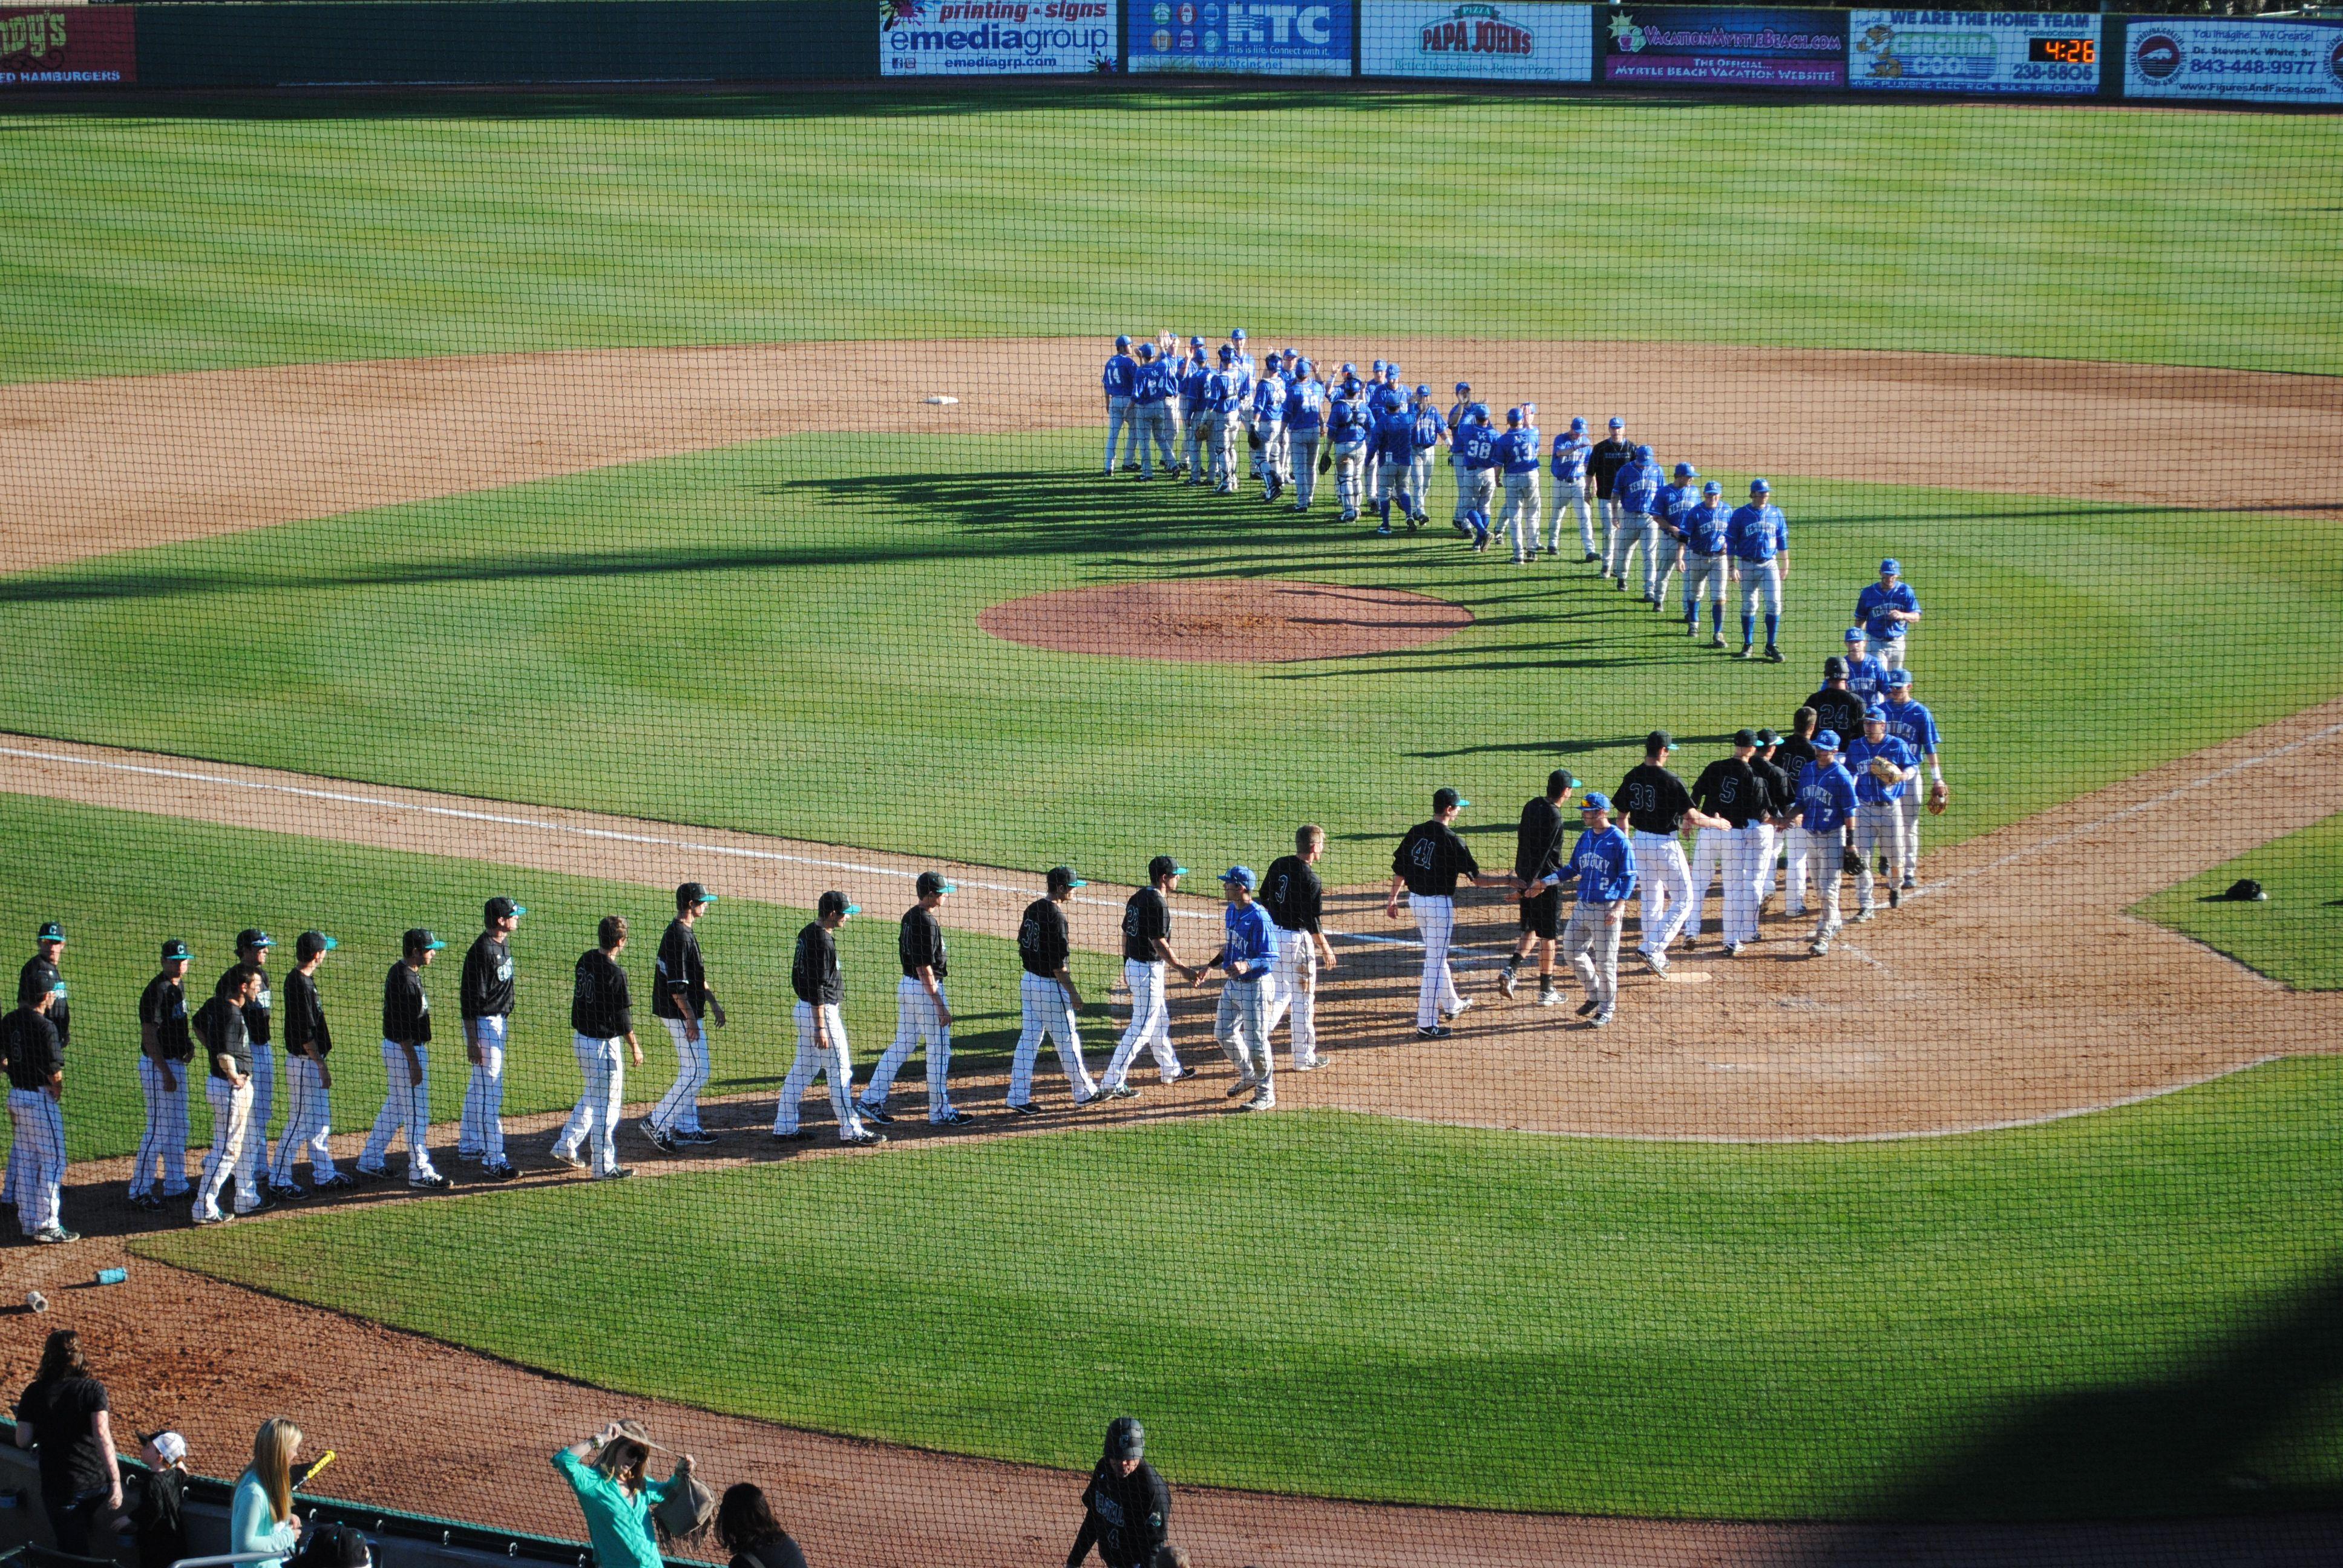 CCU Baseball 2013 is at at Pelicans